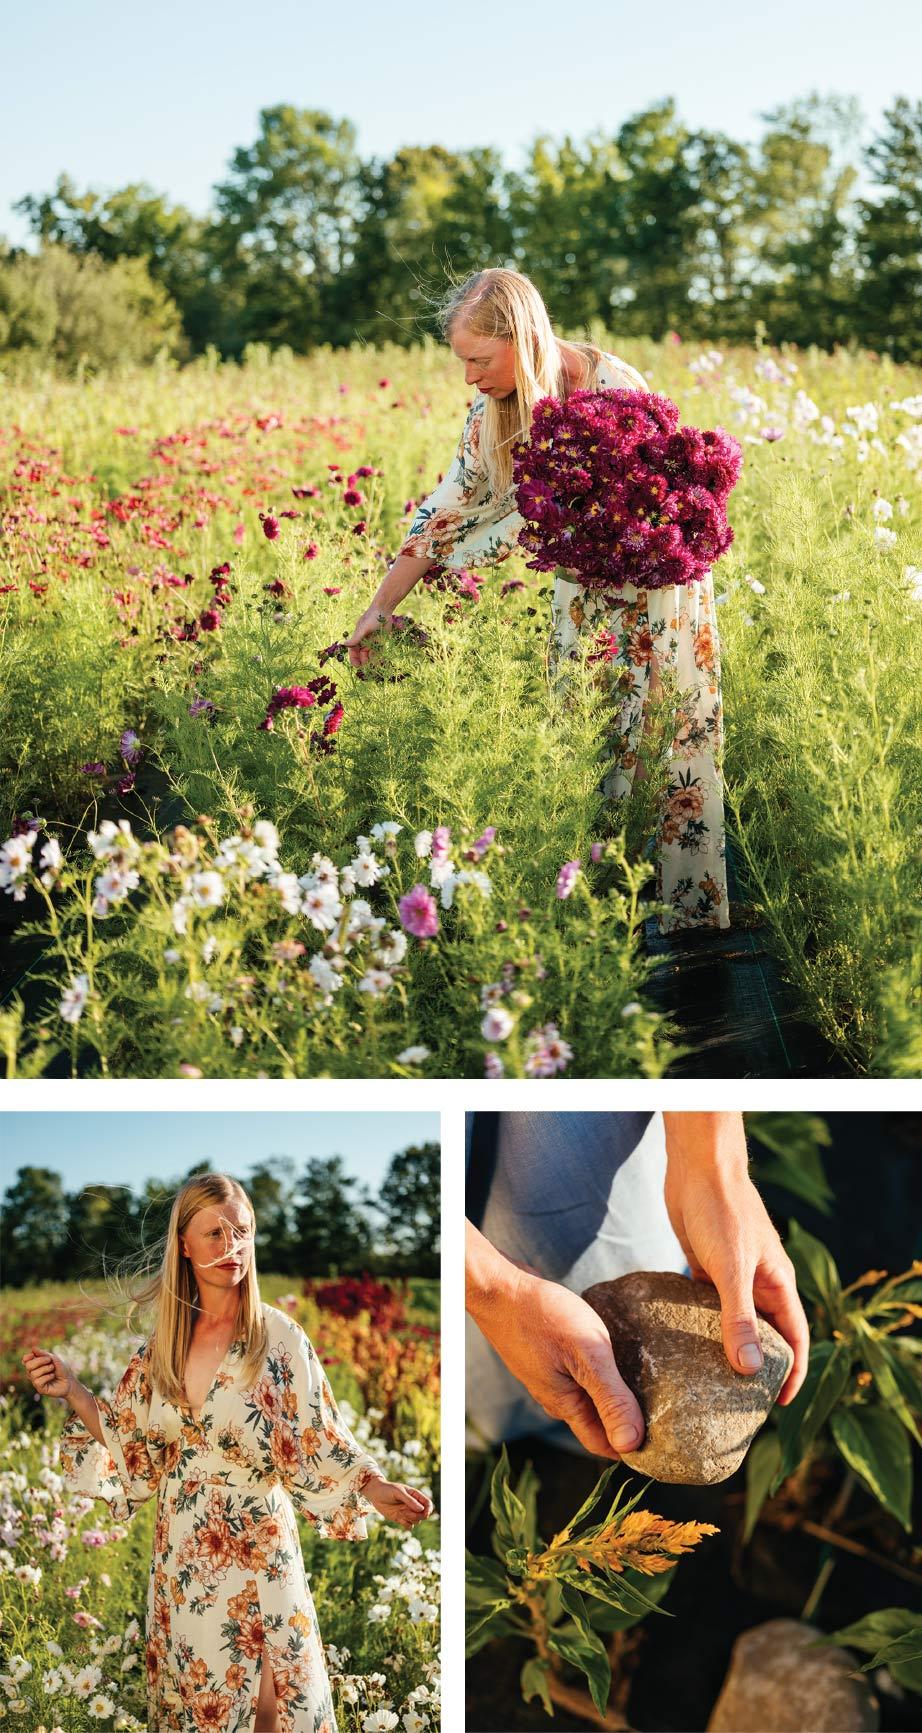 Melanie Harrington on her flower farm